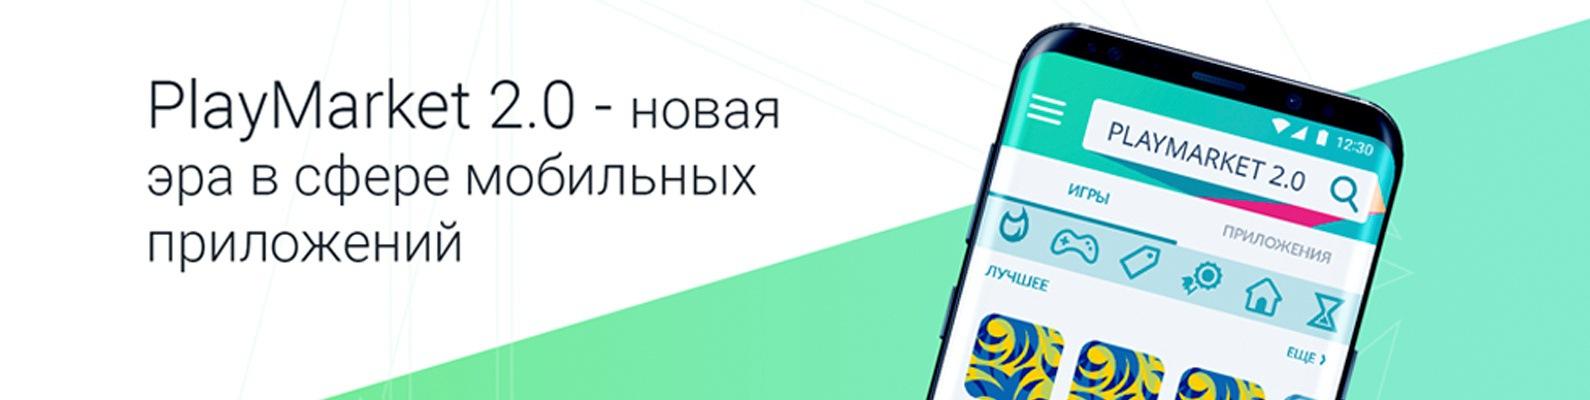 dao playmarket bitcointalk)